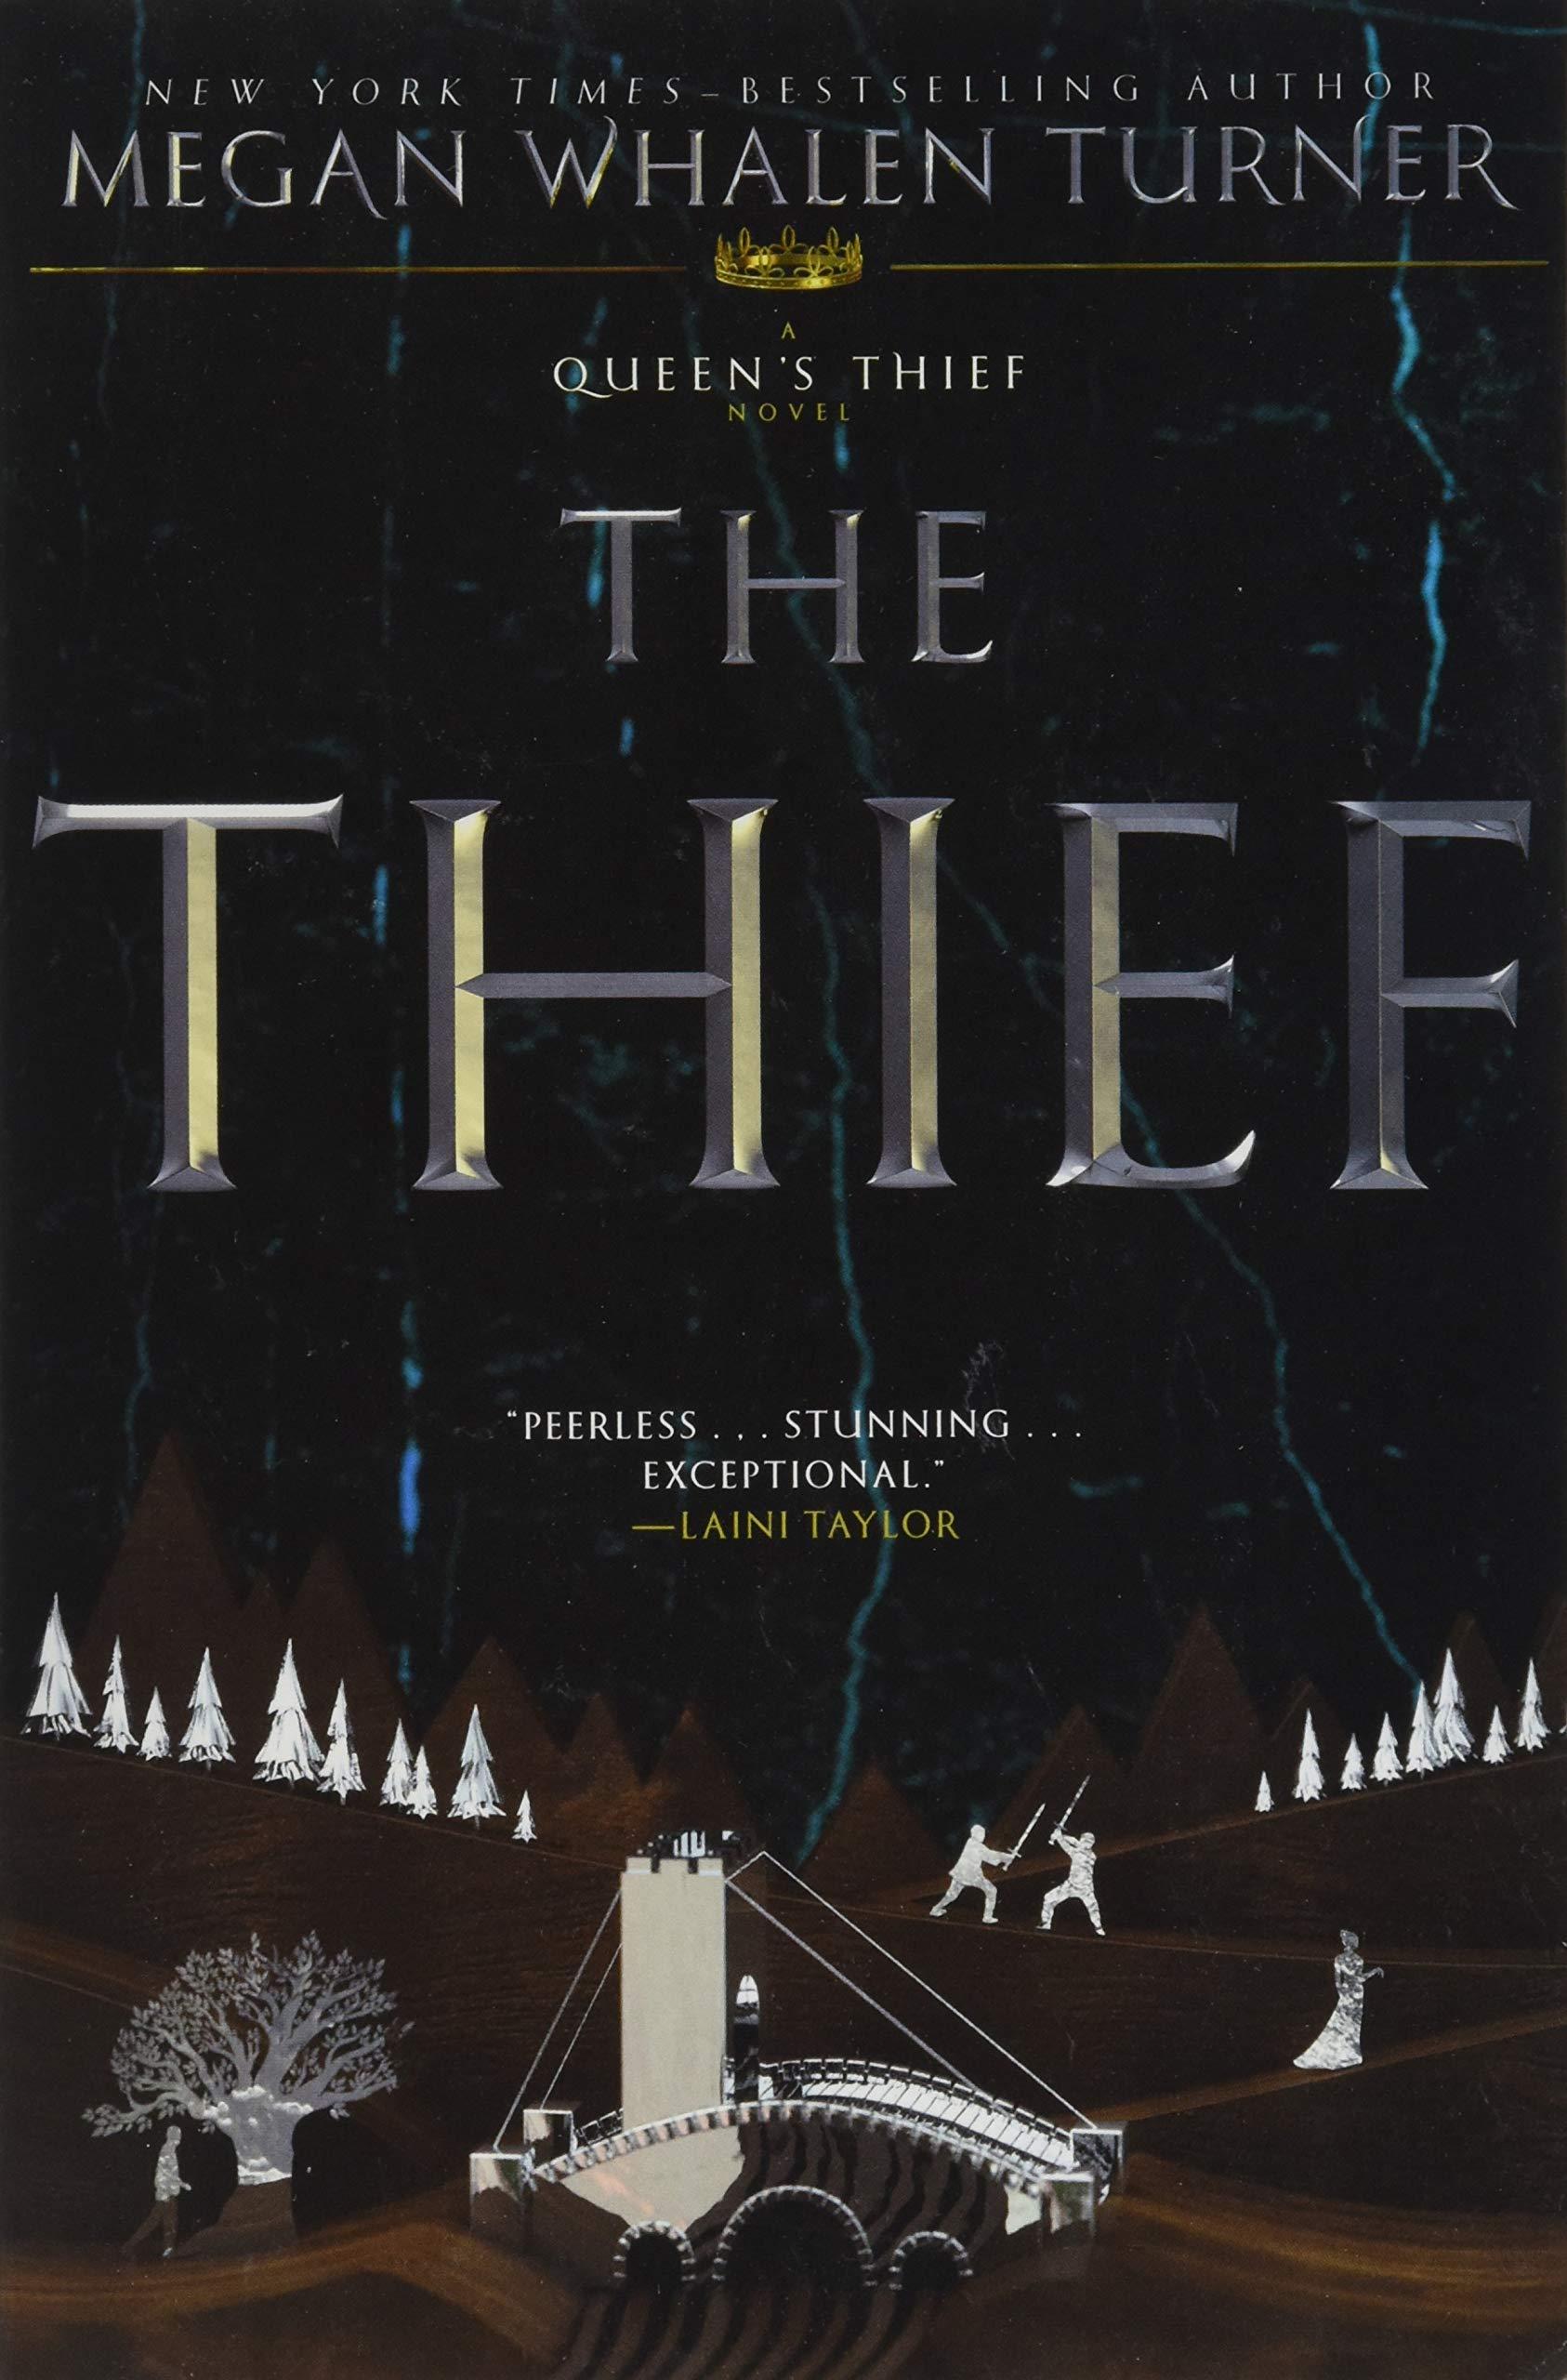 The Thief: 1 (Queen's Thief): Amazon.co.uk: Turner, Megan Whalen: Books